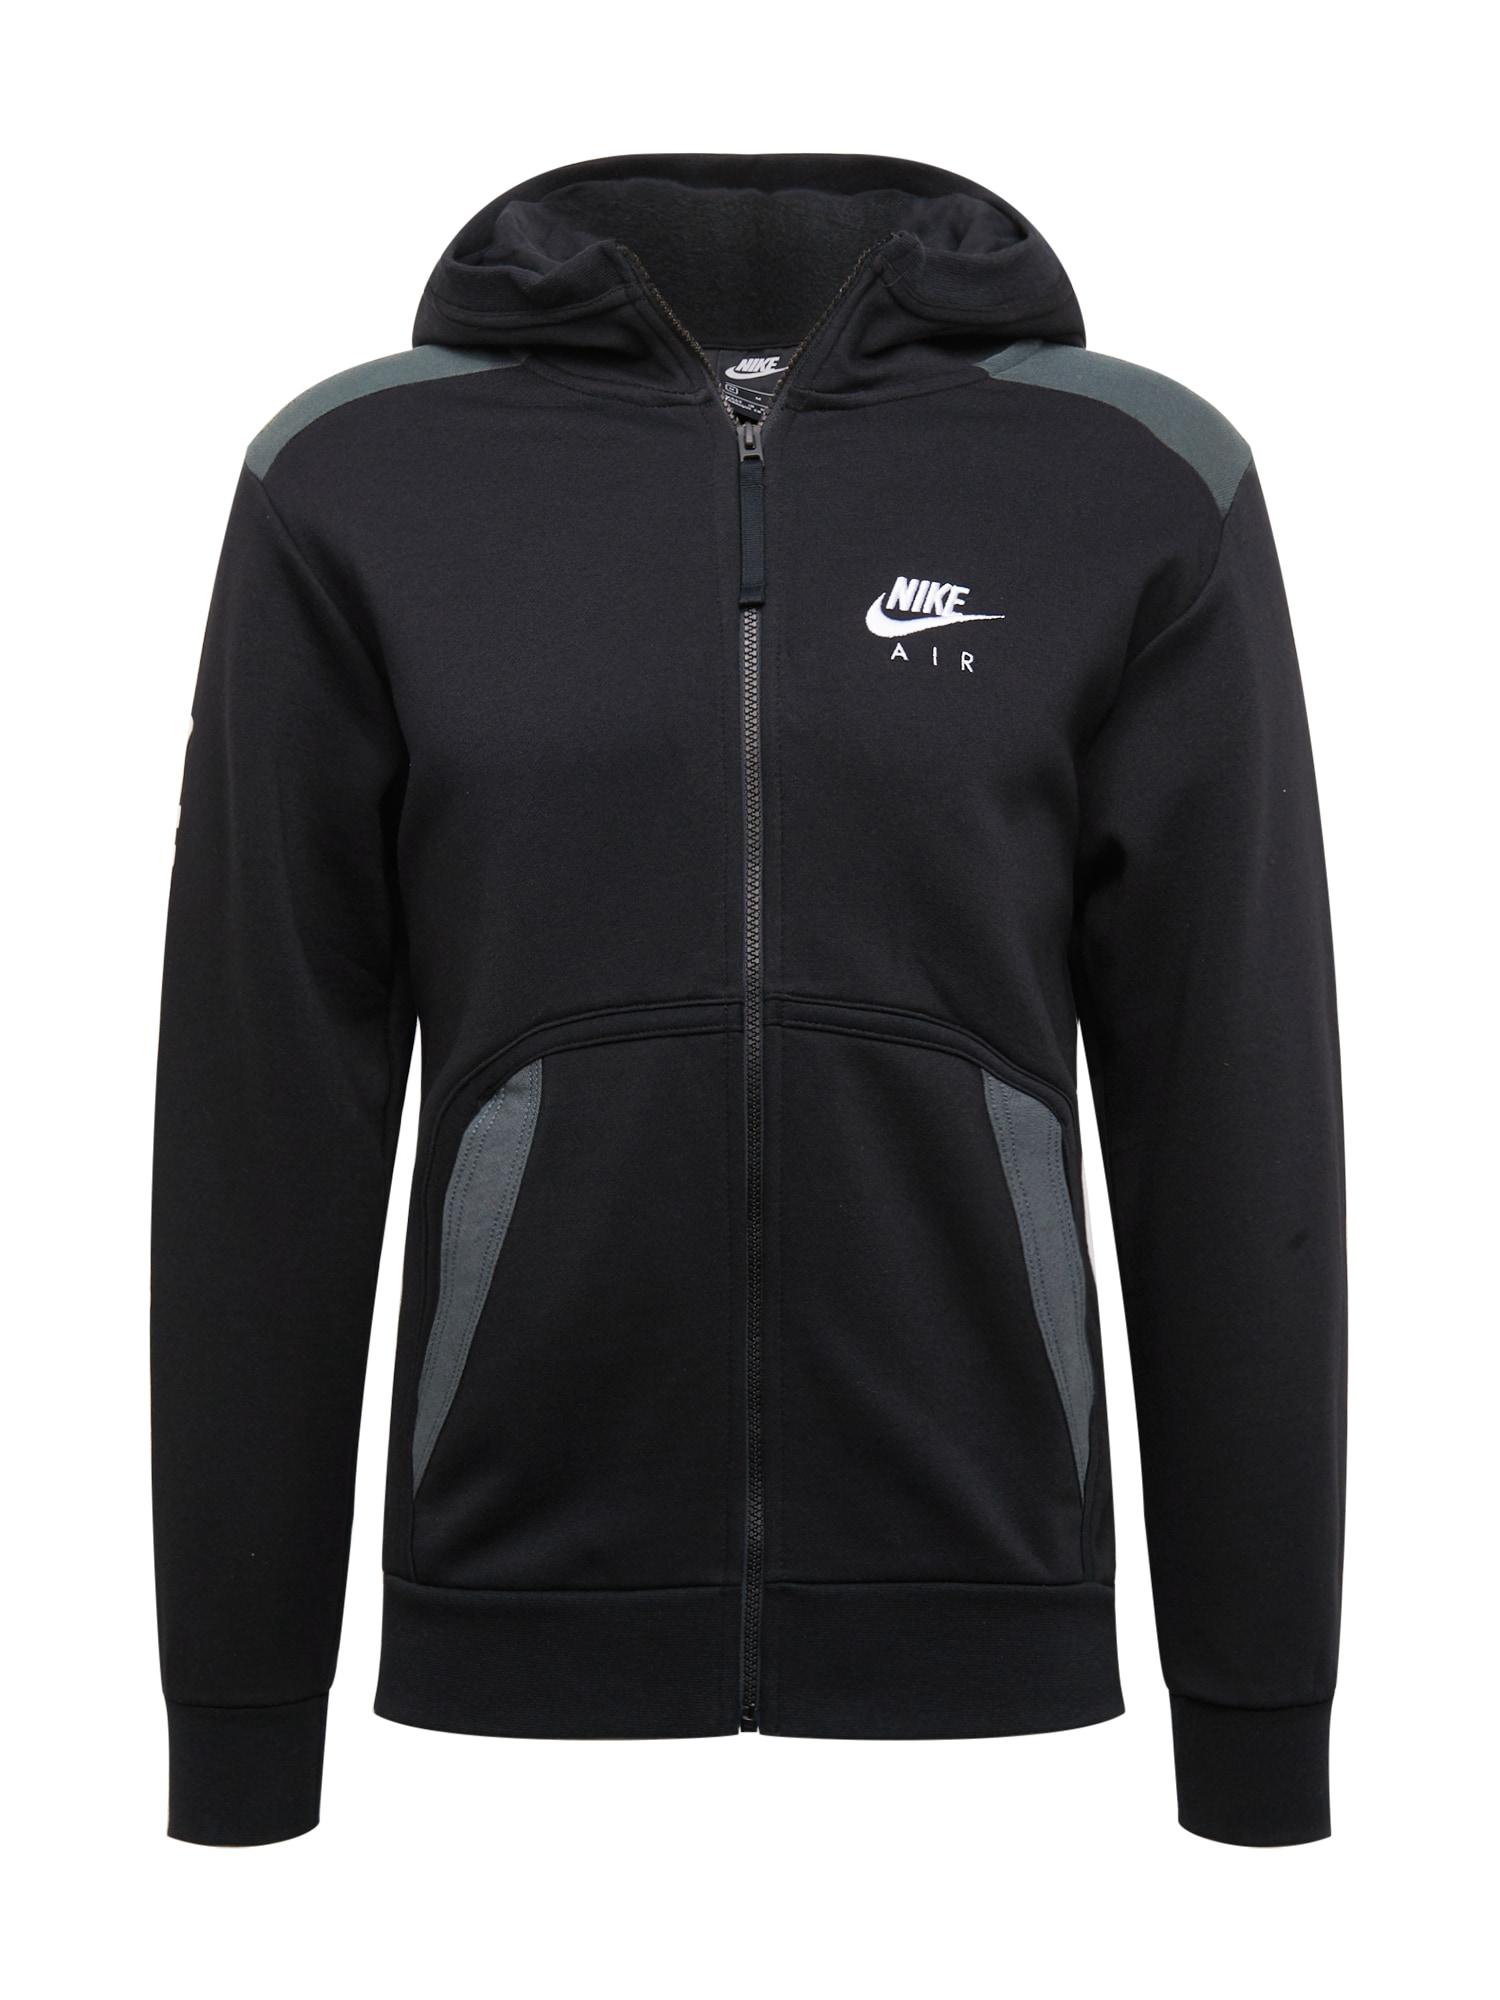 Nike Sportswear Džemperis juoda / dūmų pilka / balta